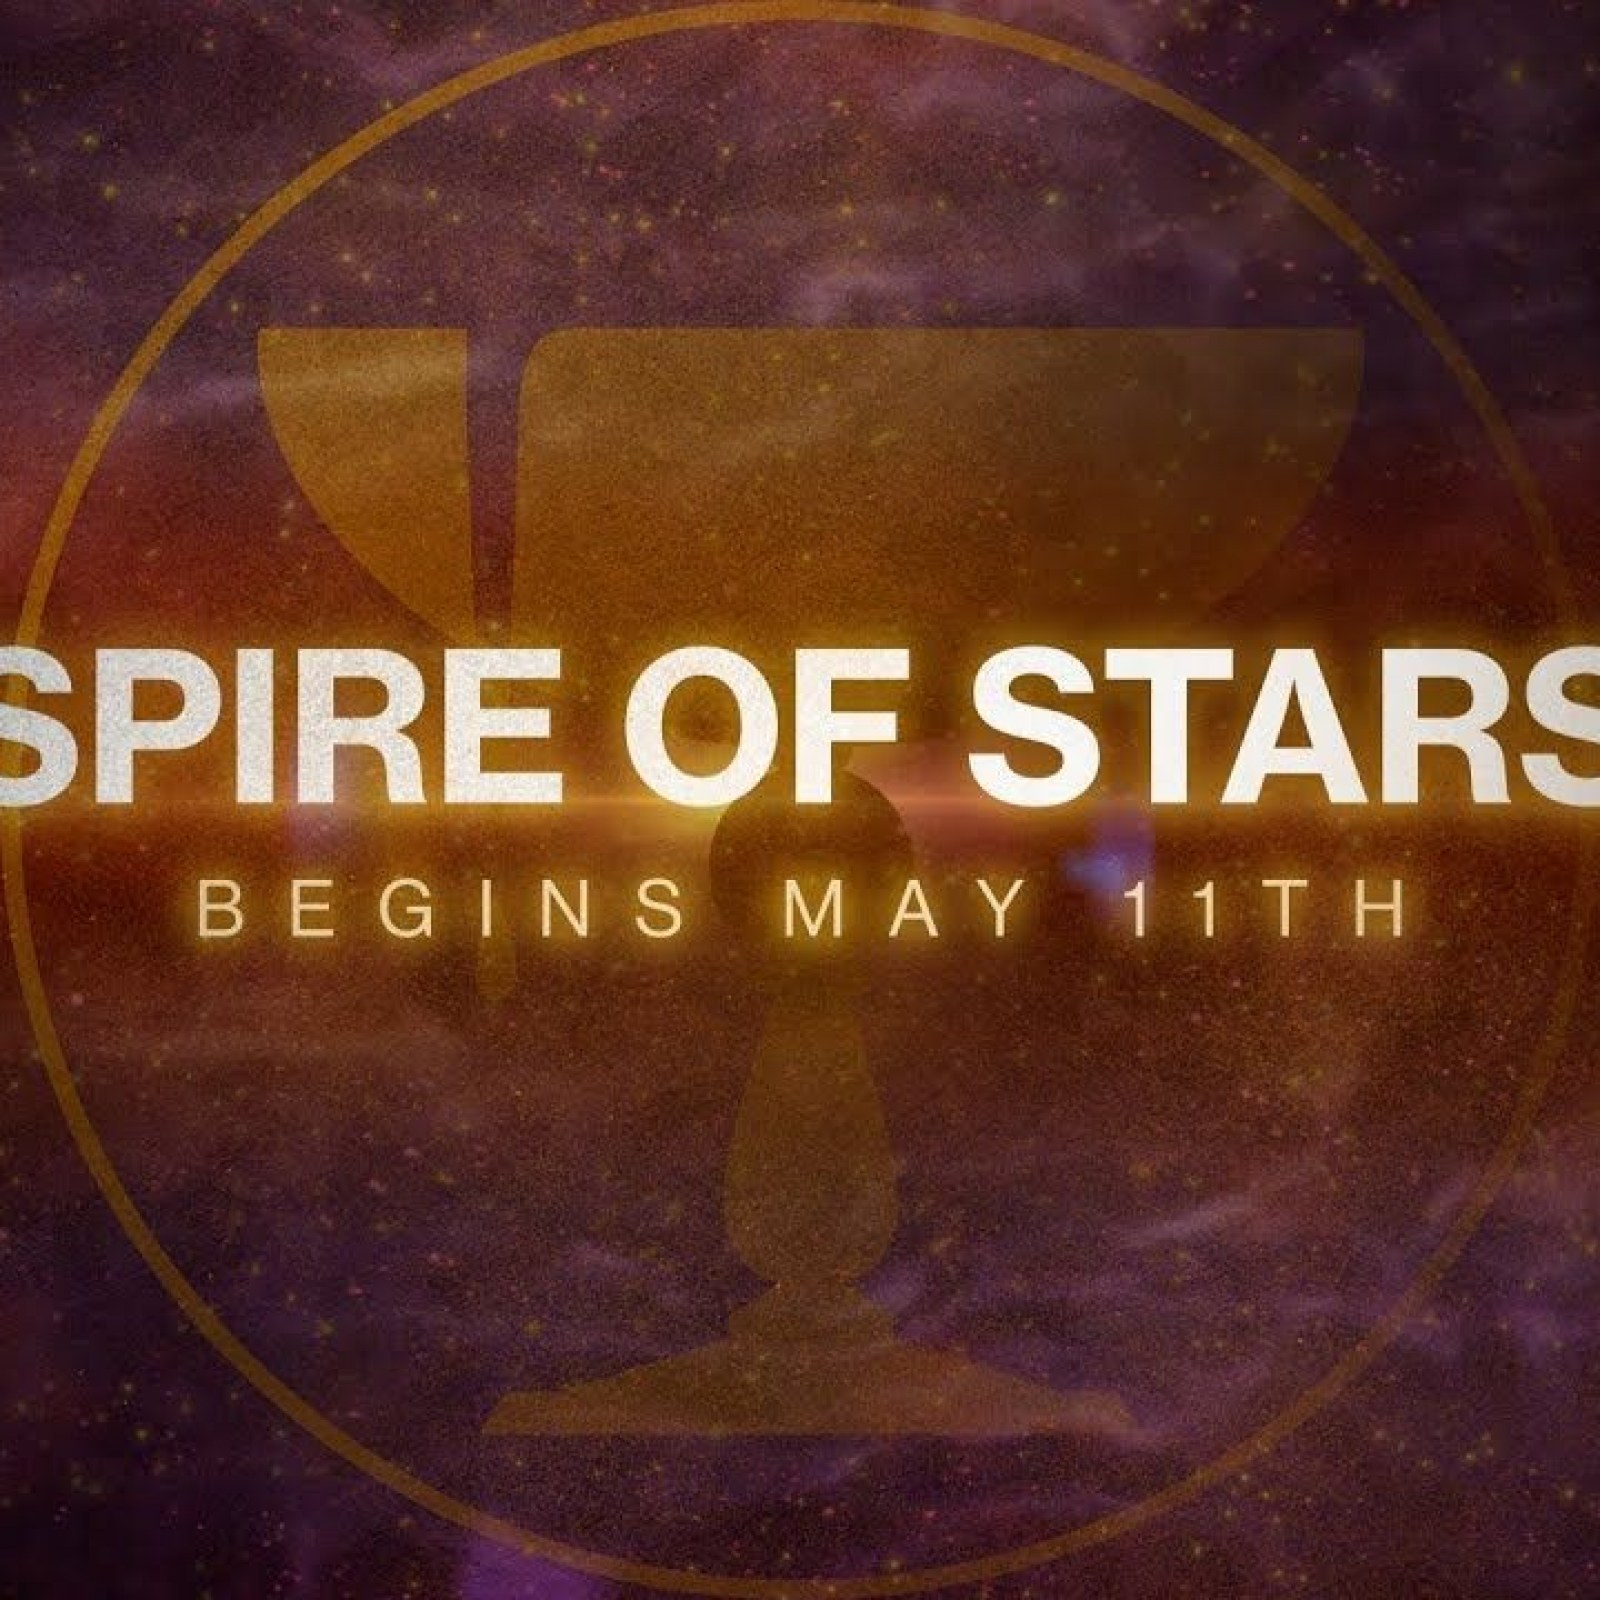 Destiny 2' Spire of Stars Walkthrough & Guide - How to Beat the Raid